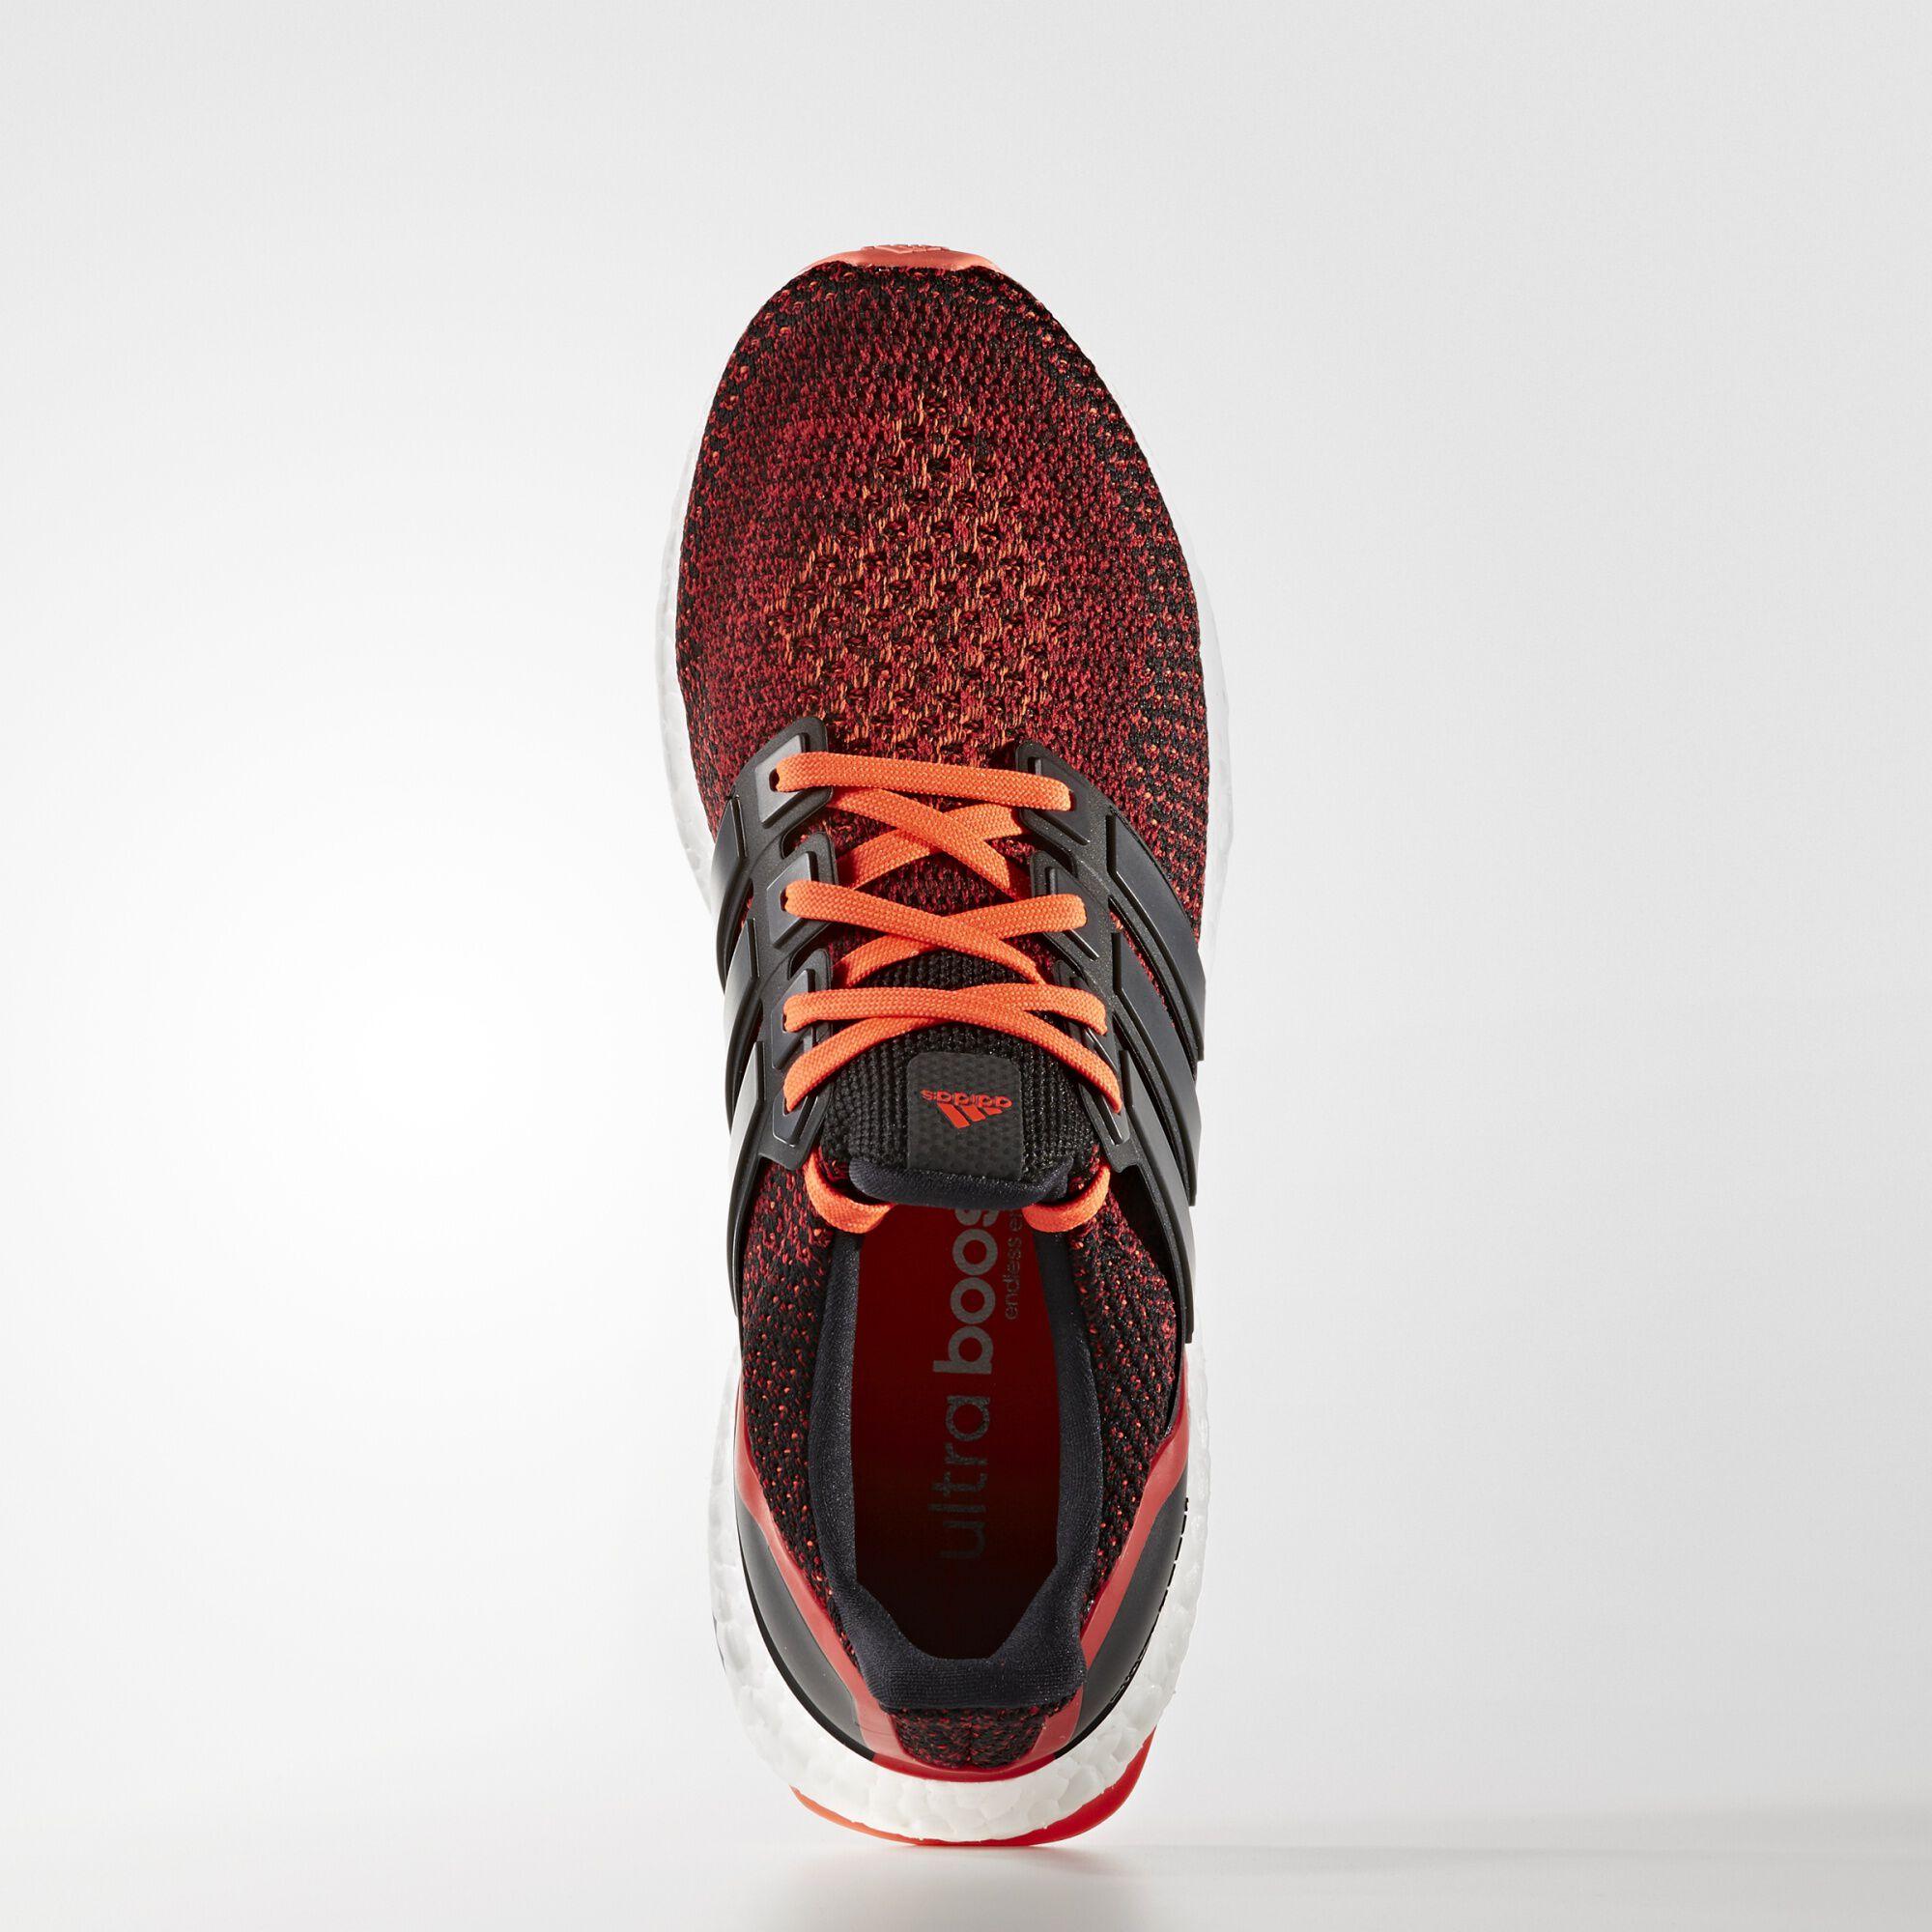 f4e1fe6f3a7 adidas  Ultra Boost  Solar Red  CW  Core Black Core Black Solar Red SKU   AQ5930 Release  05.16.16. Retail   180